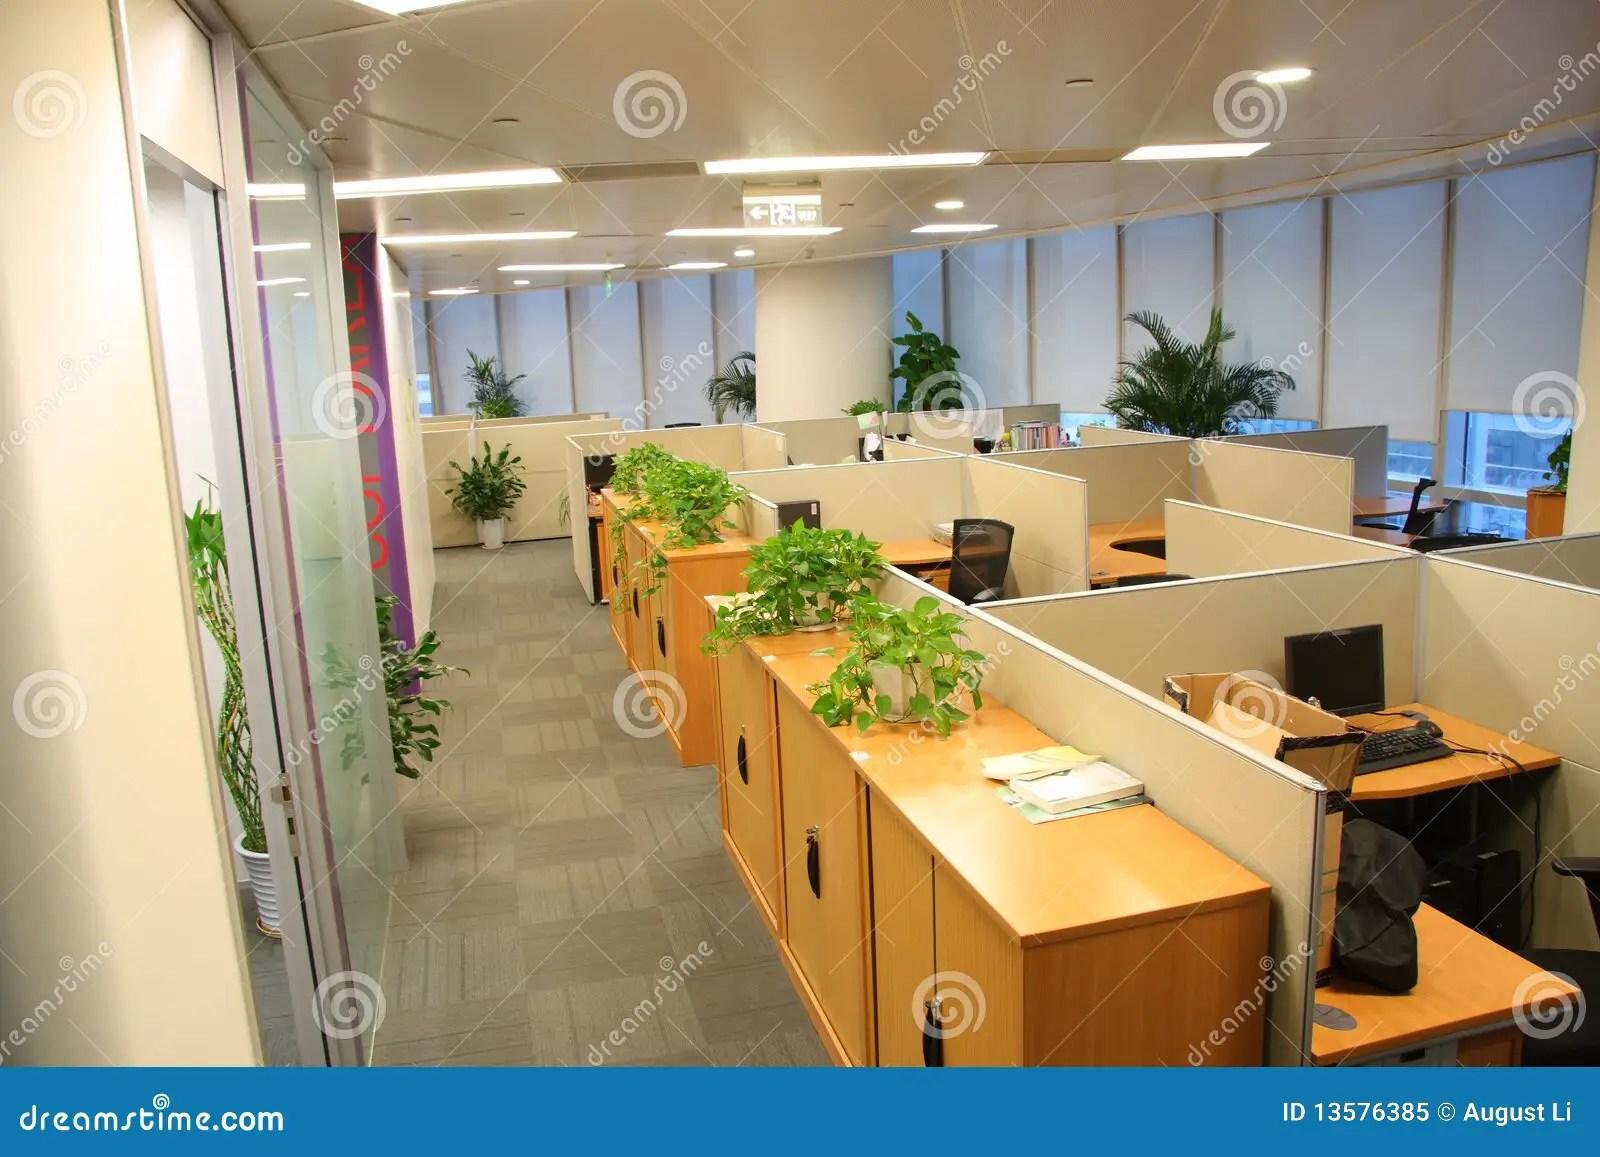 Office settings stock image Image of furnishing inside